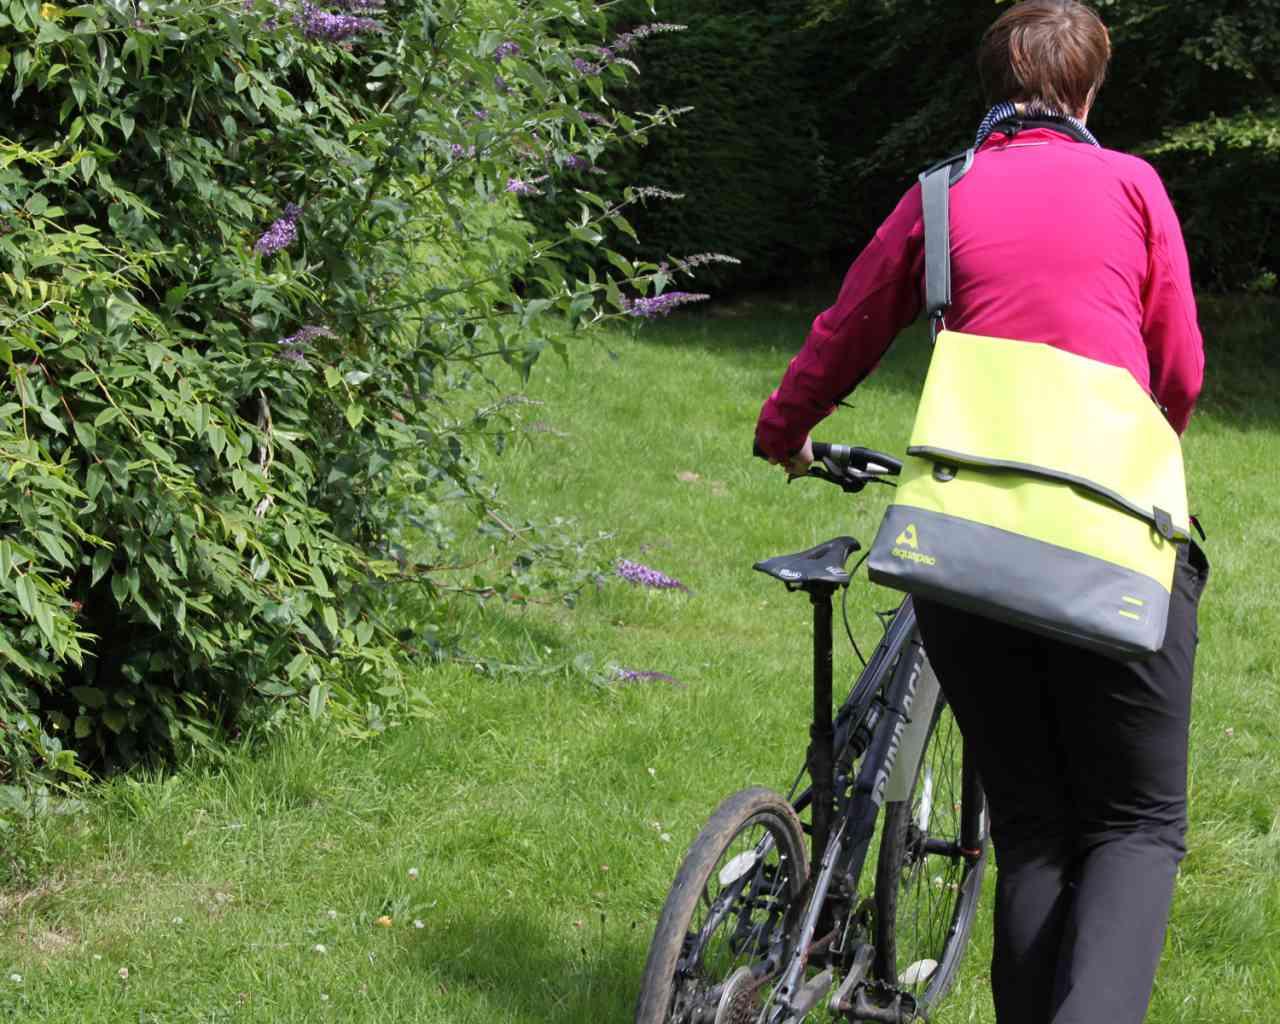 Брызгозащитная сумка Aquapac 053 - TrailProof™ Tote Bag – Large.. Aquapac - №1 в мире водонепроницаемых чехлов и сумок. Фото 4